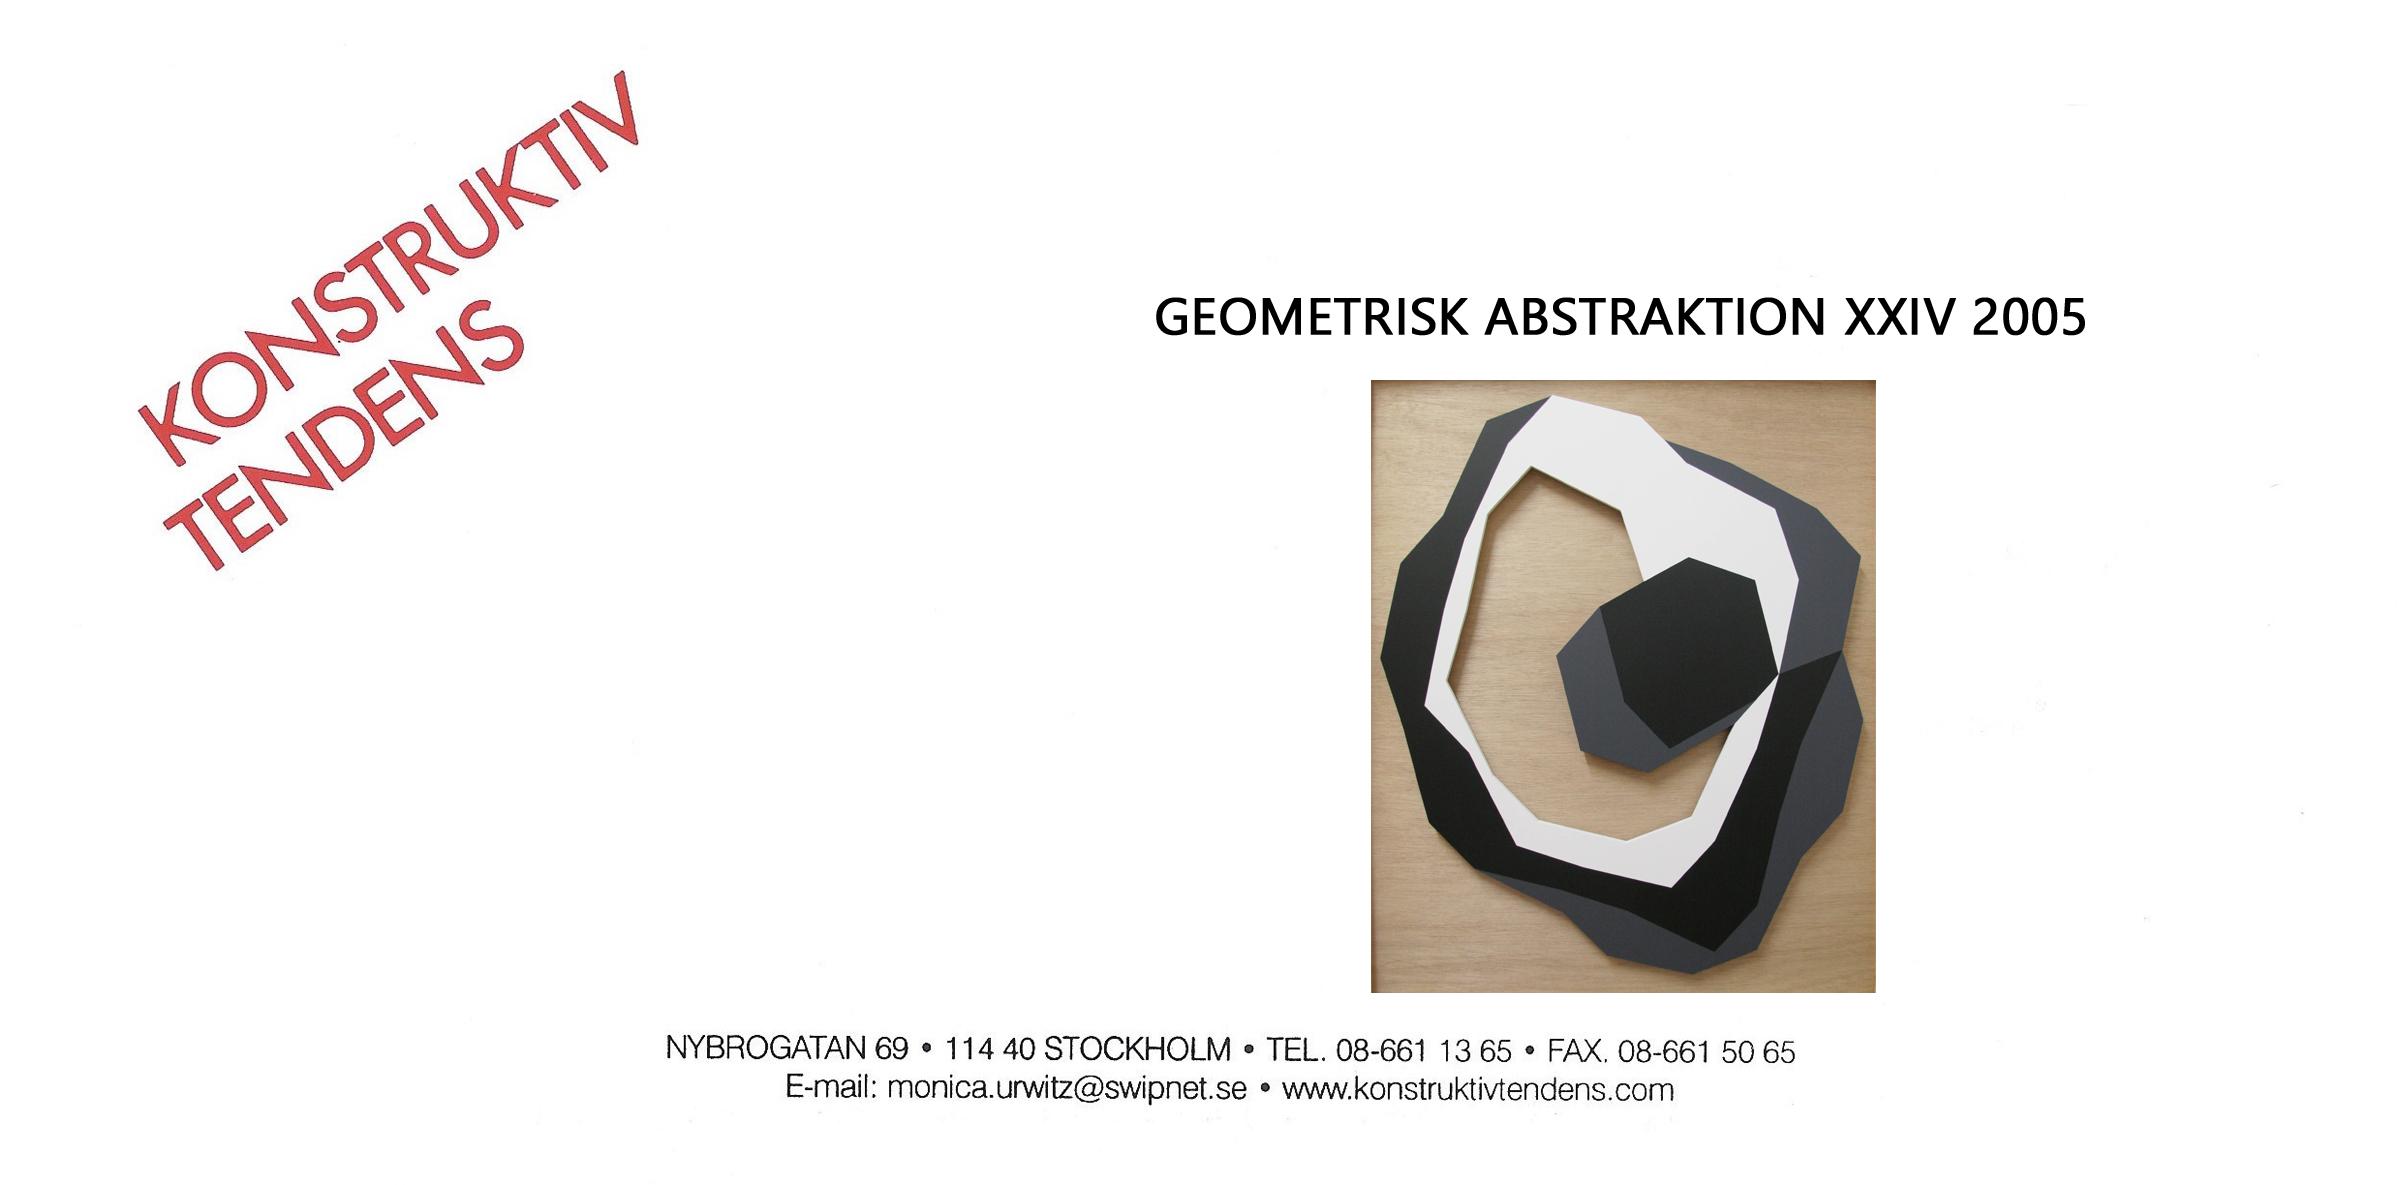 2005 Geometrisk Abstraktion XXIV   Galerie Konstruktiv Tendens, Stockholm, SWE